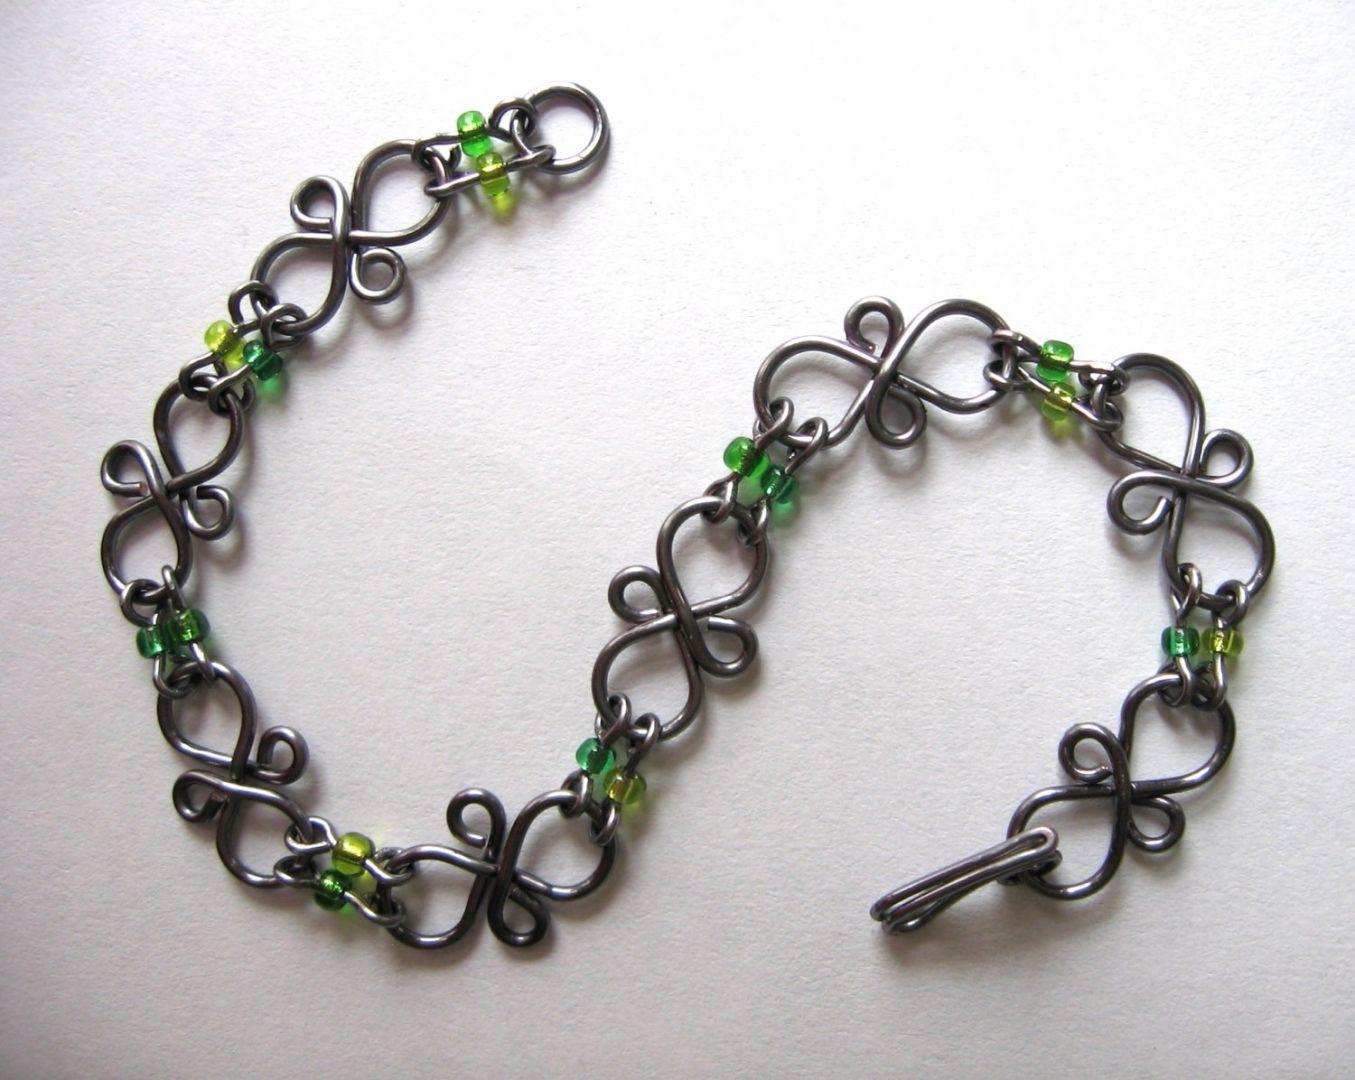 handmade decorative wire links - Google Search | Crafts - Jewelry ...